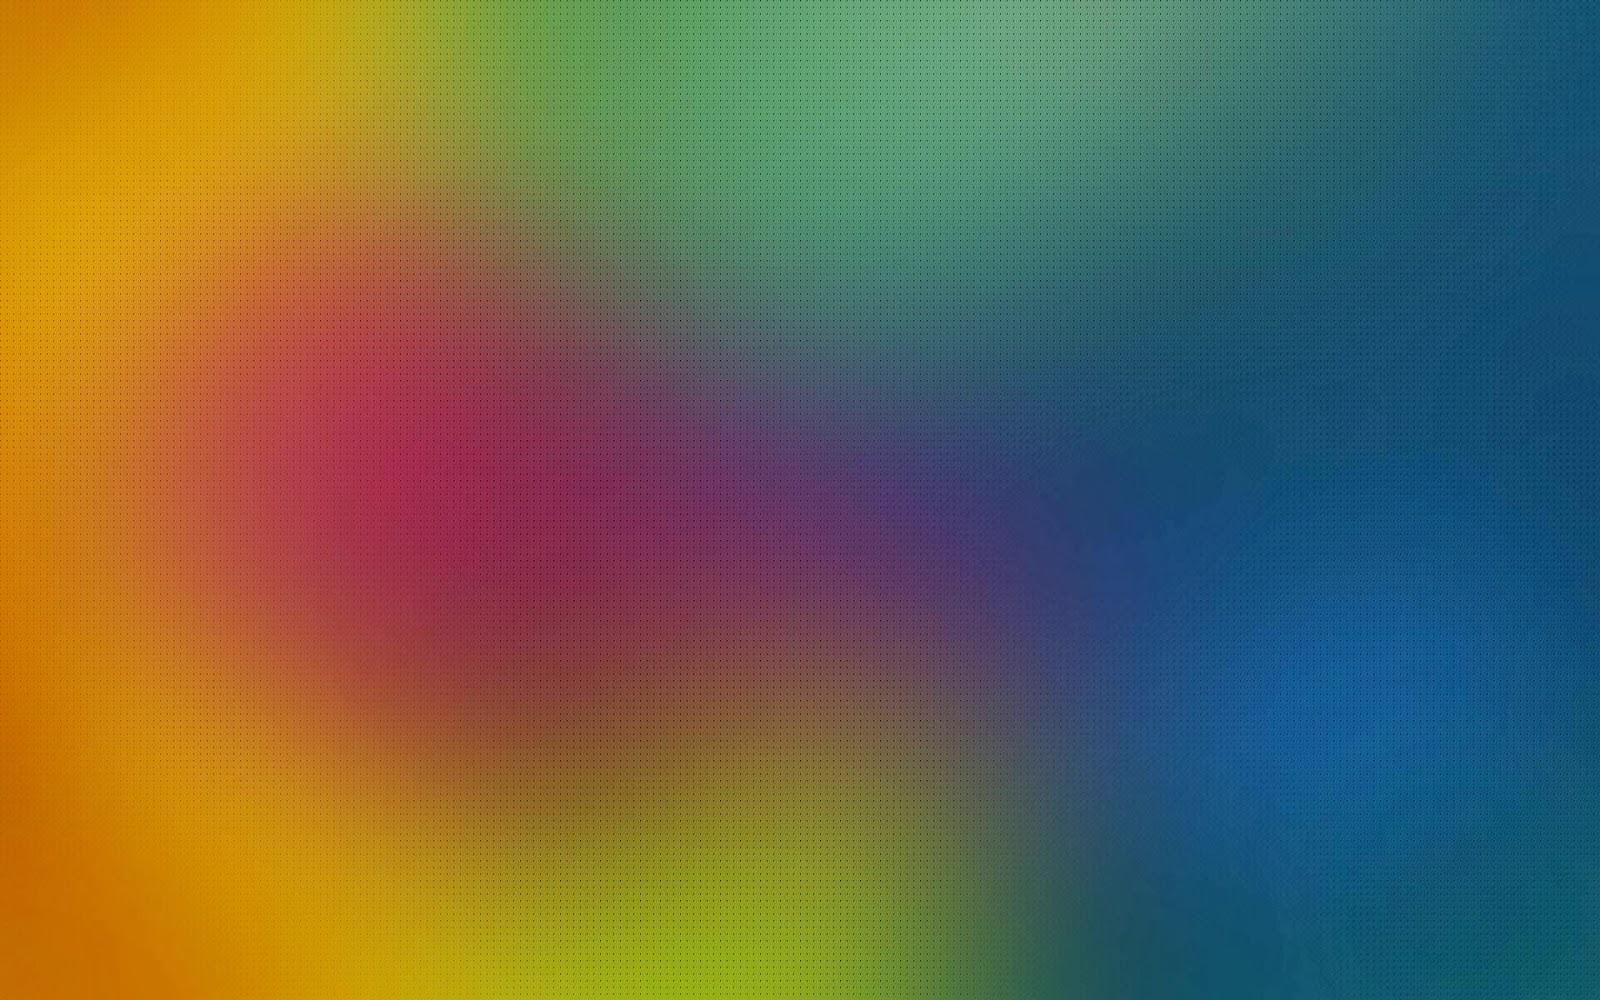 Fondos Abstractos De Colores: Fondo De Pantalla Abstracto Mezcla De Colores